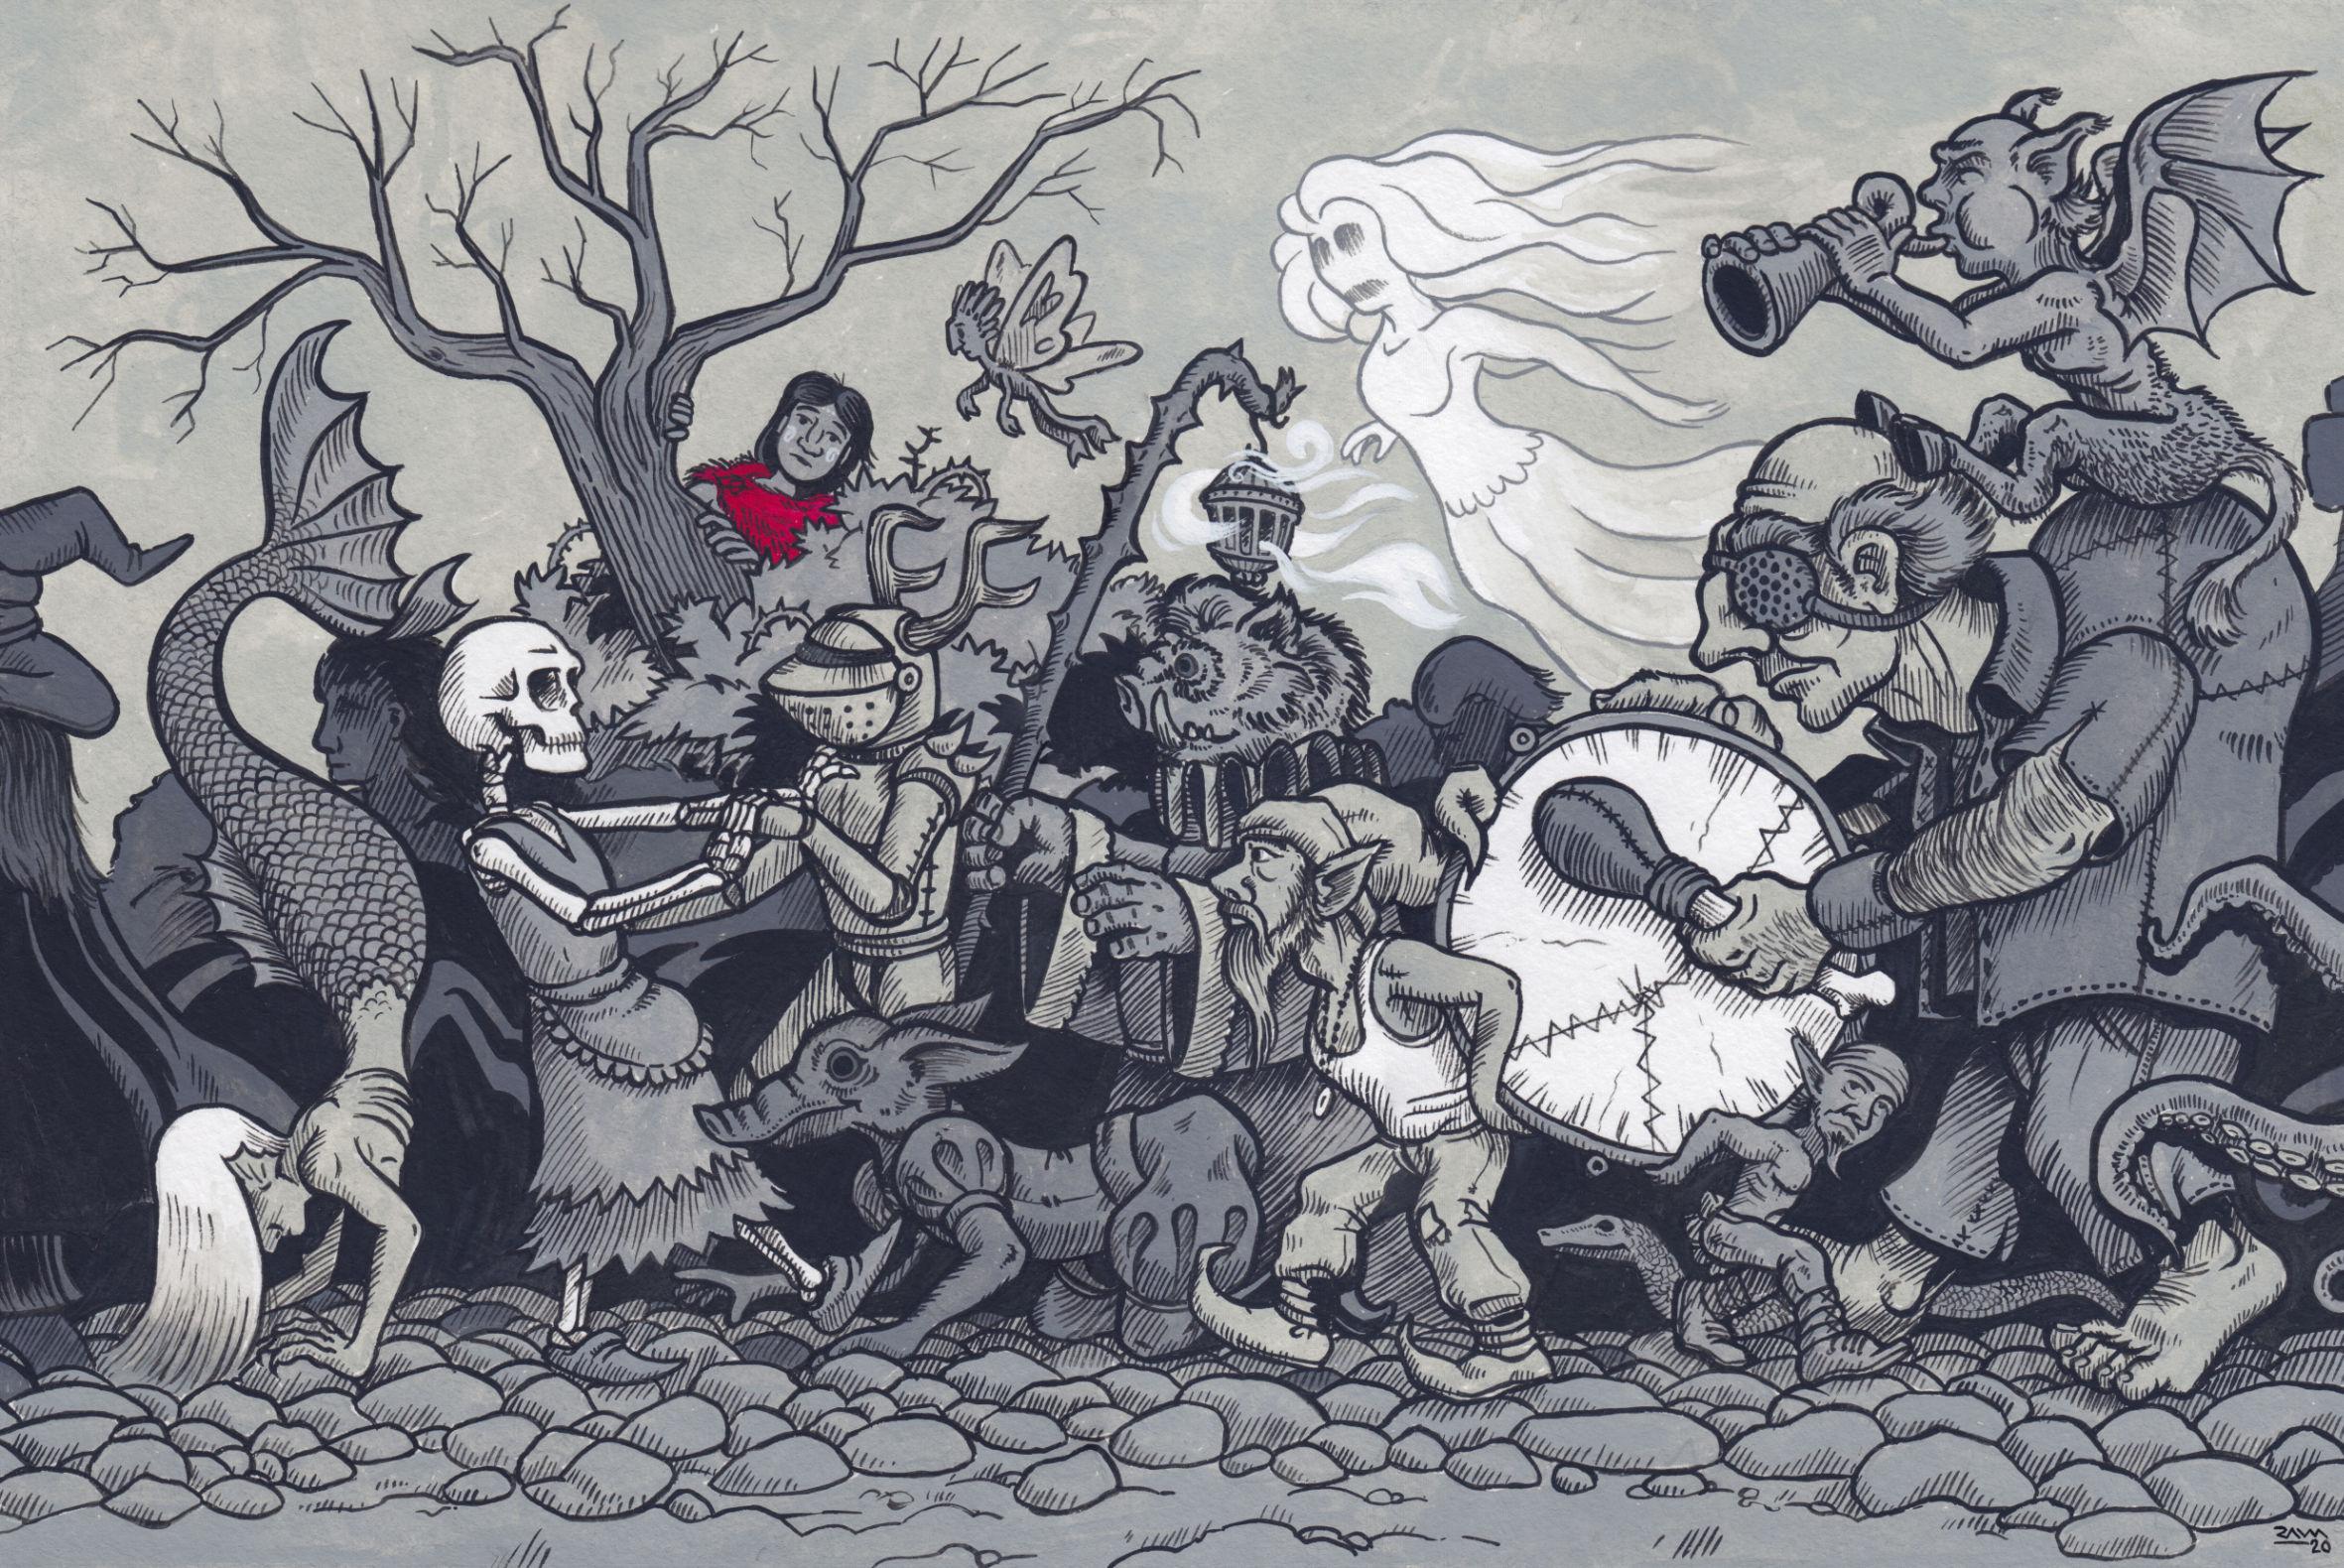 La marcha de la gentuza